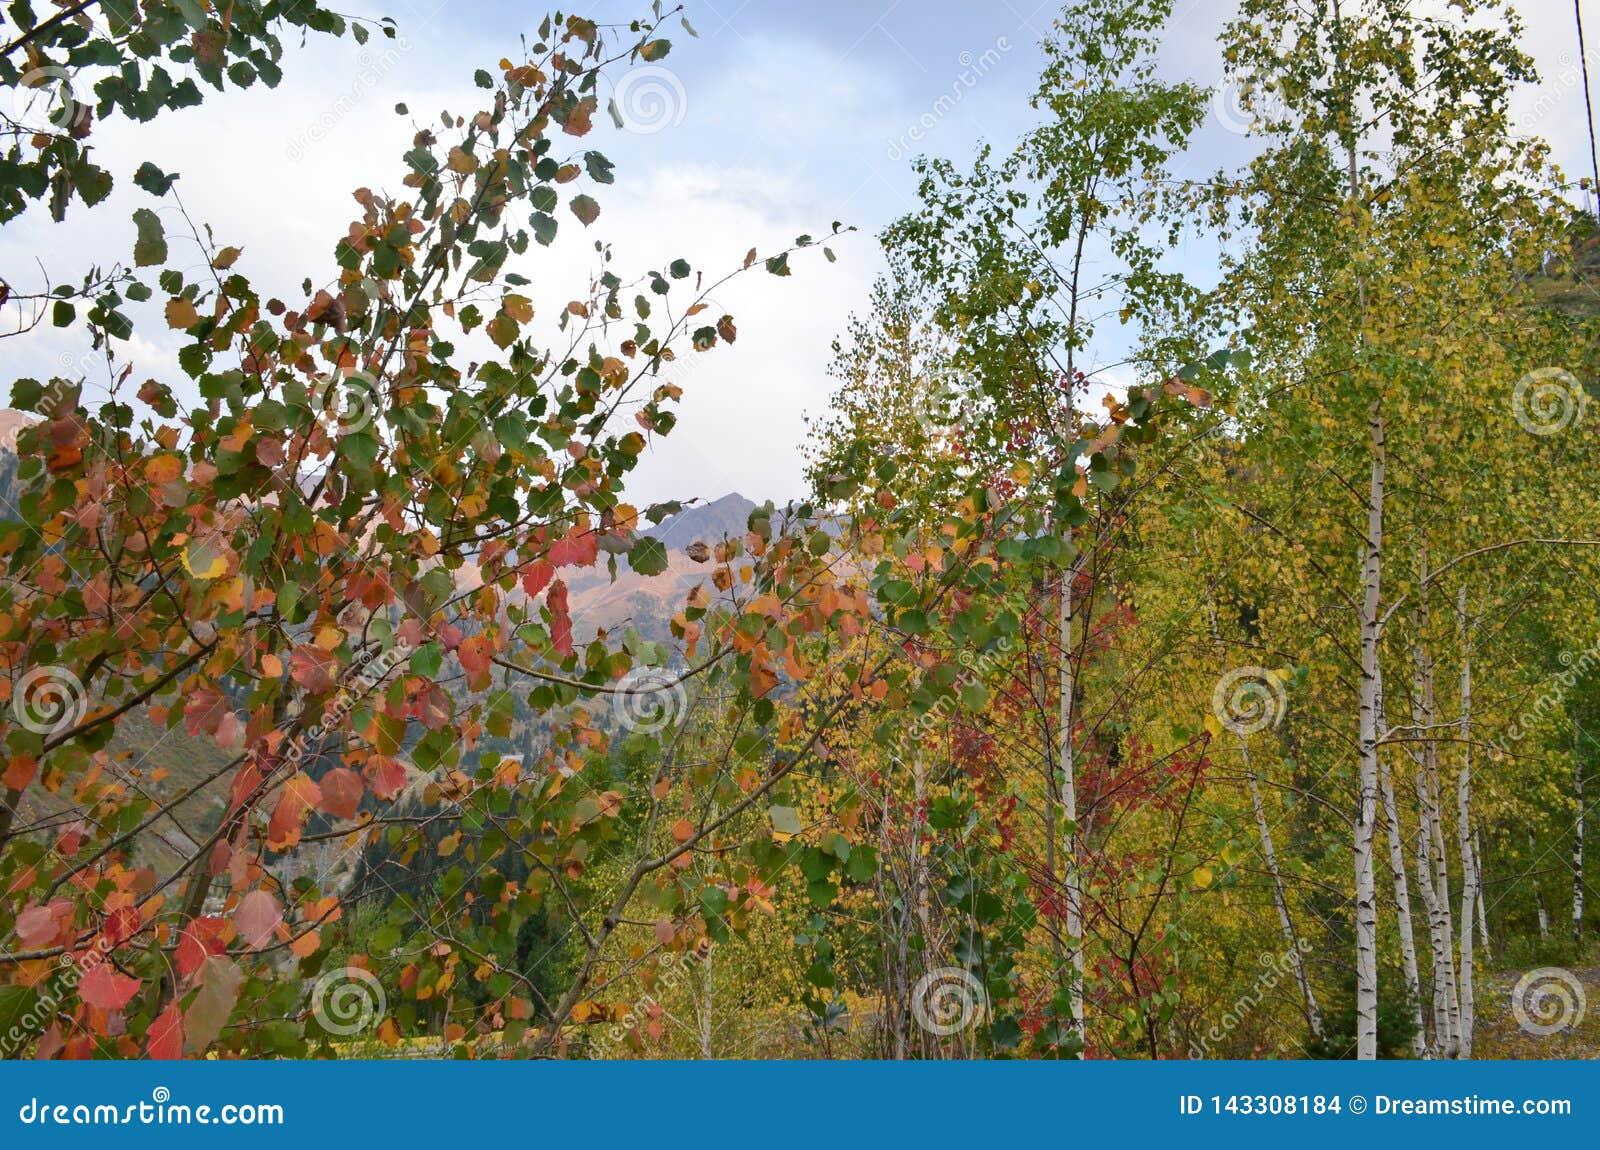 Fighting autumn with summer. Birch Grove.